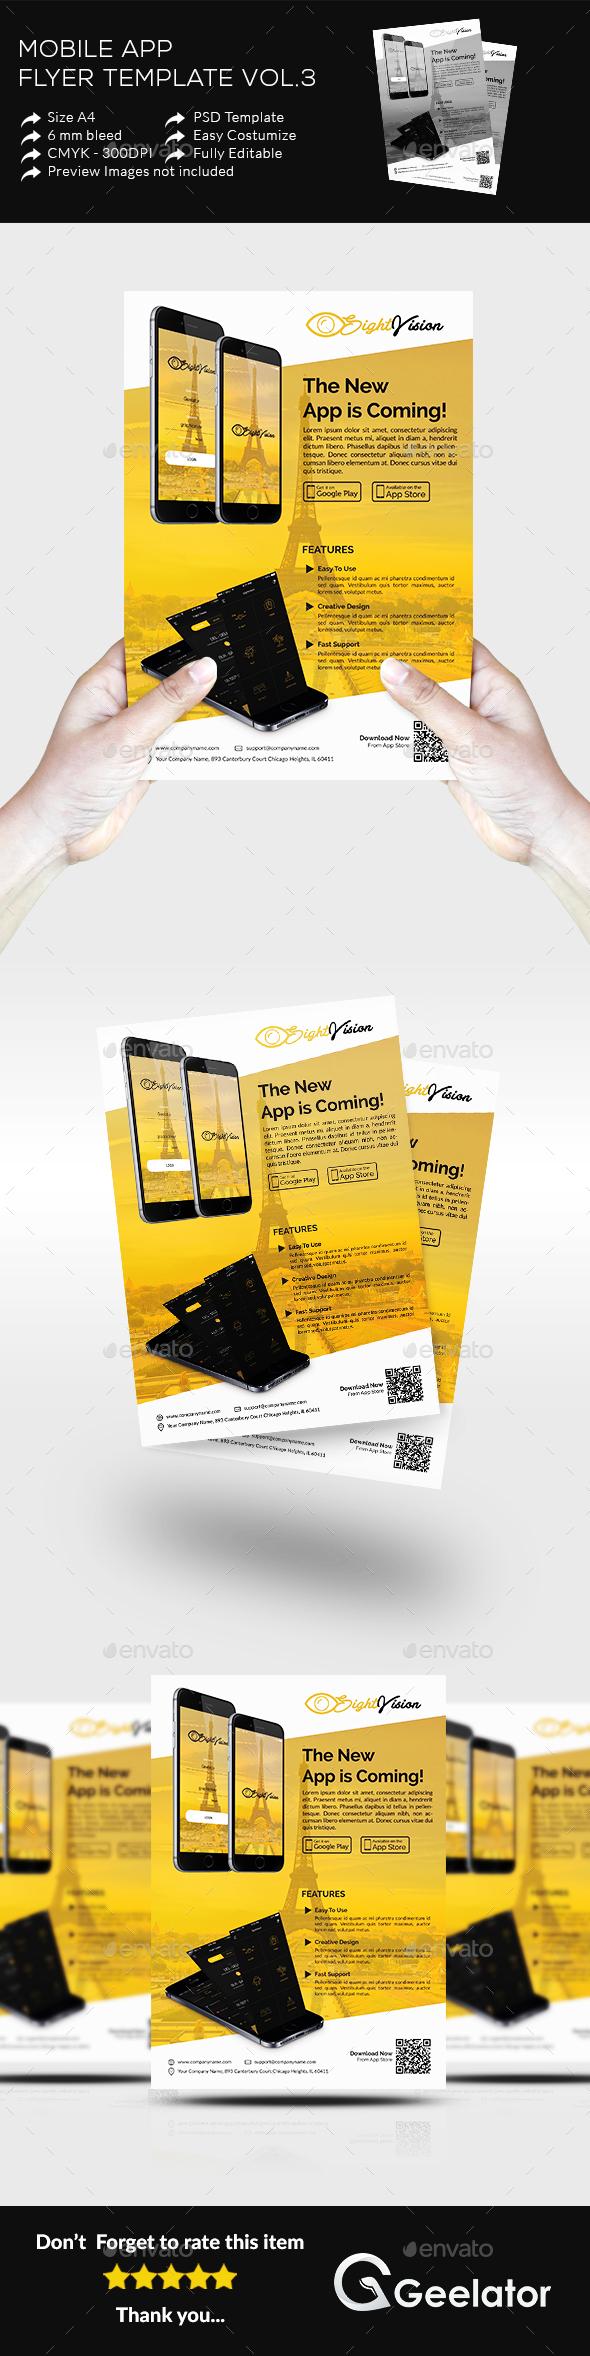 Mobile App Flyer Template Vol 3 - Commerce Flyers